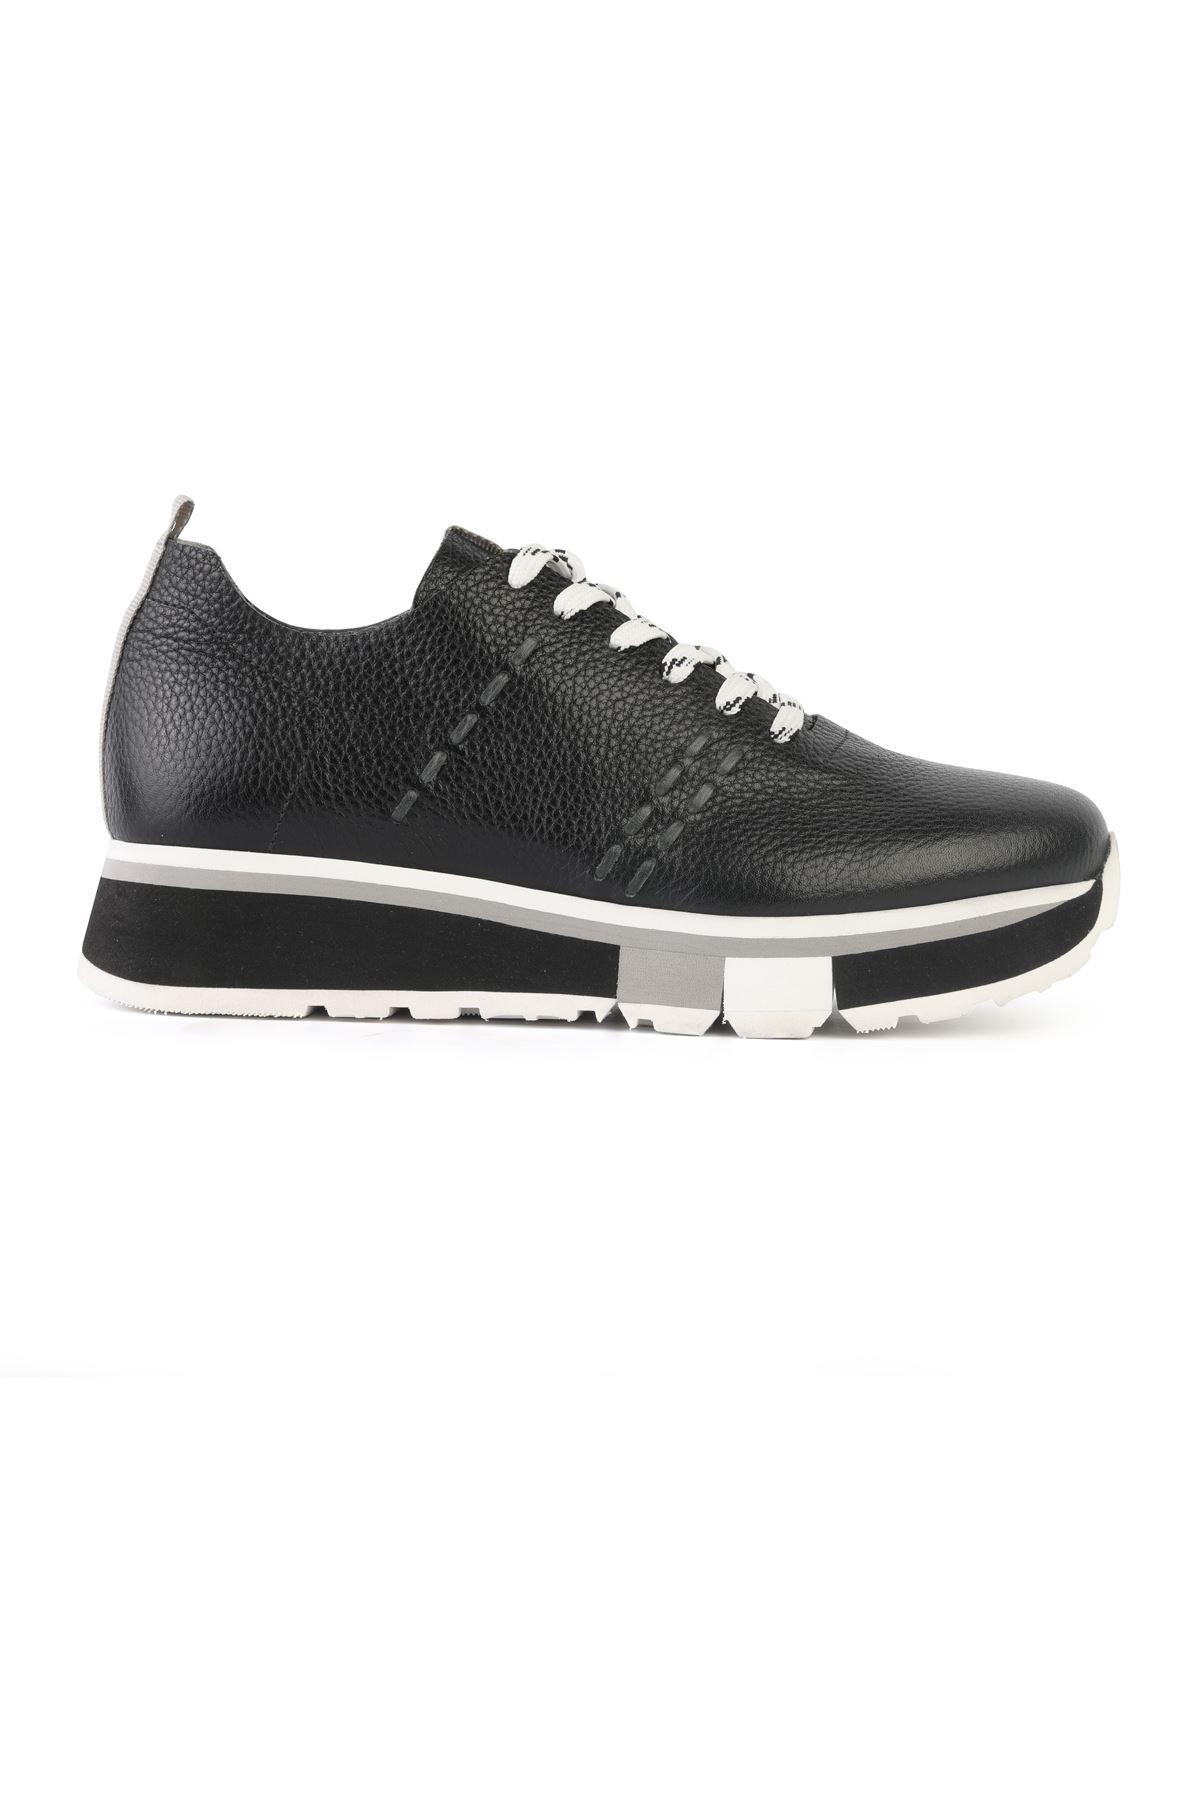 Libero L3379 Black Sports Shoes